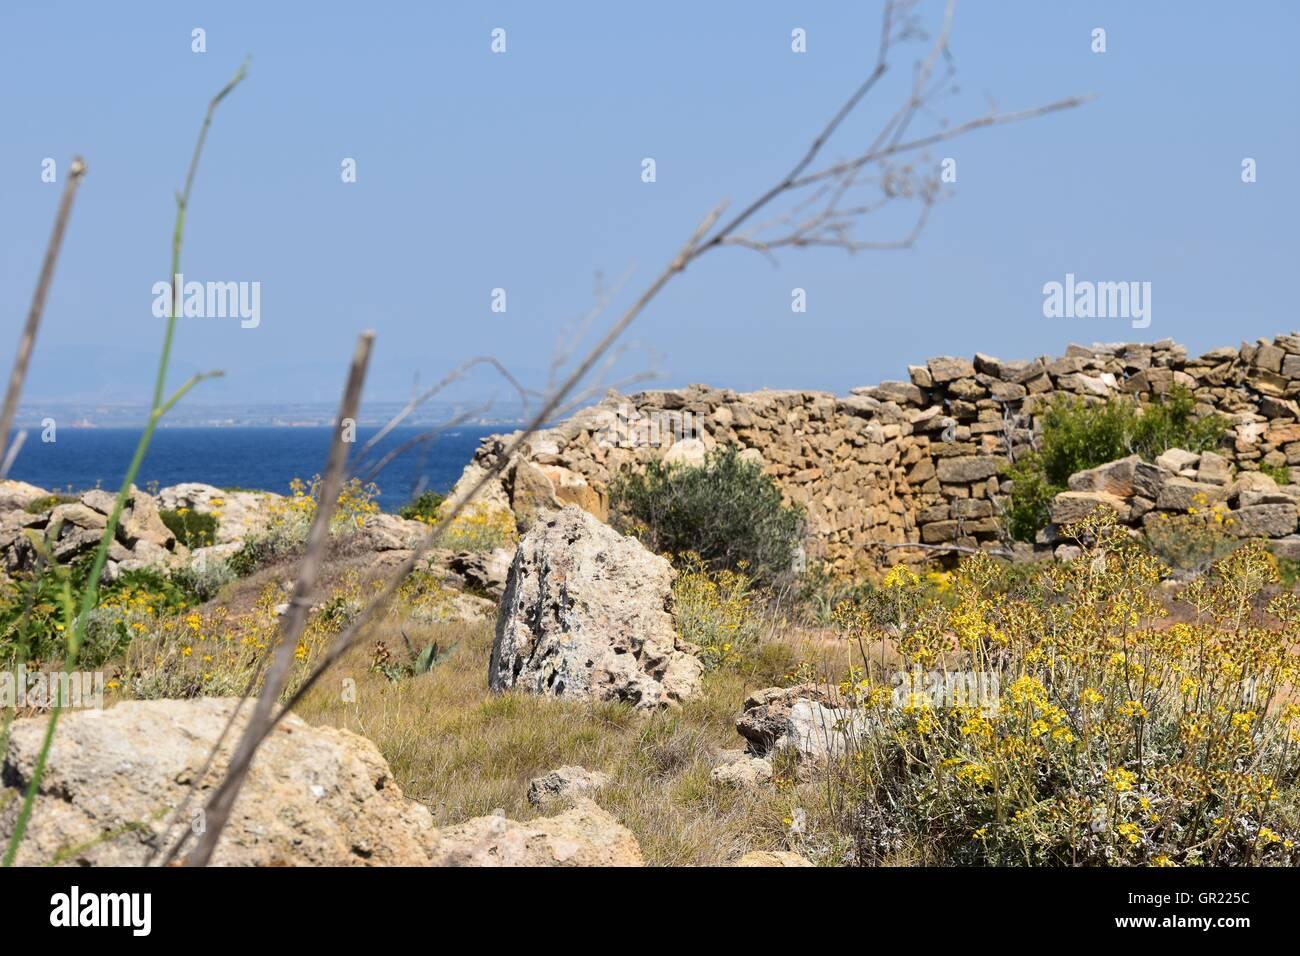 Rural desert landscape  near the sea Favignana, Sicily, Italy - Stock Image